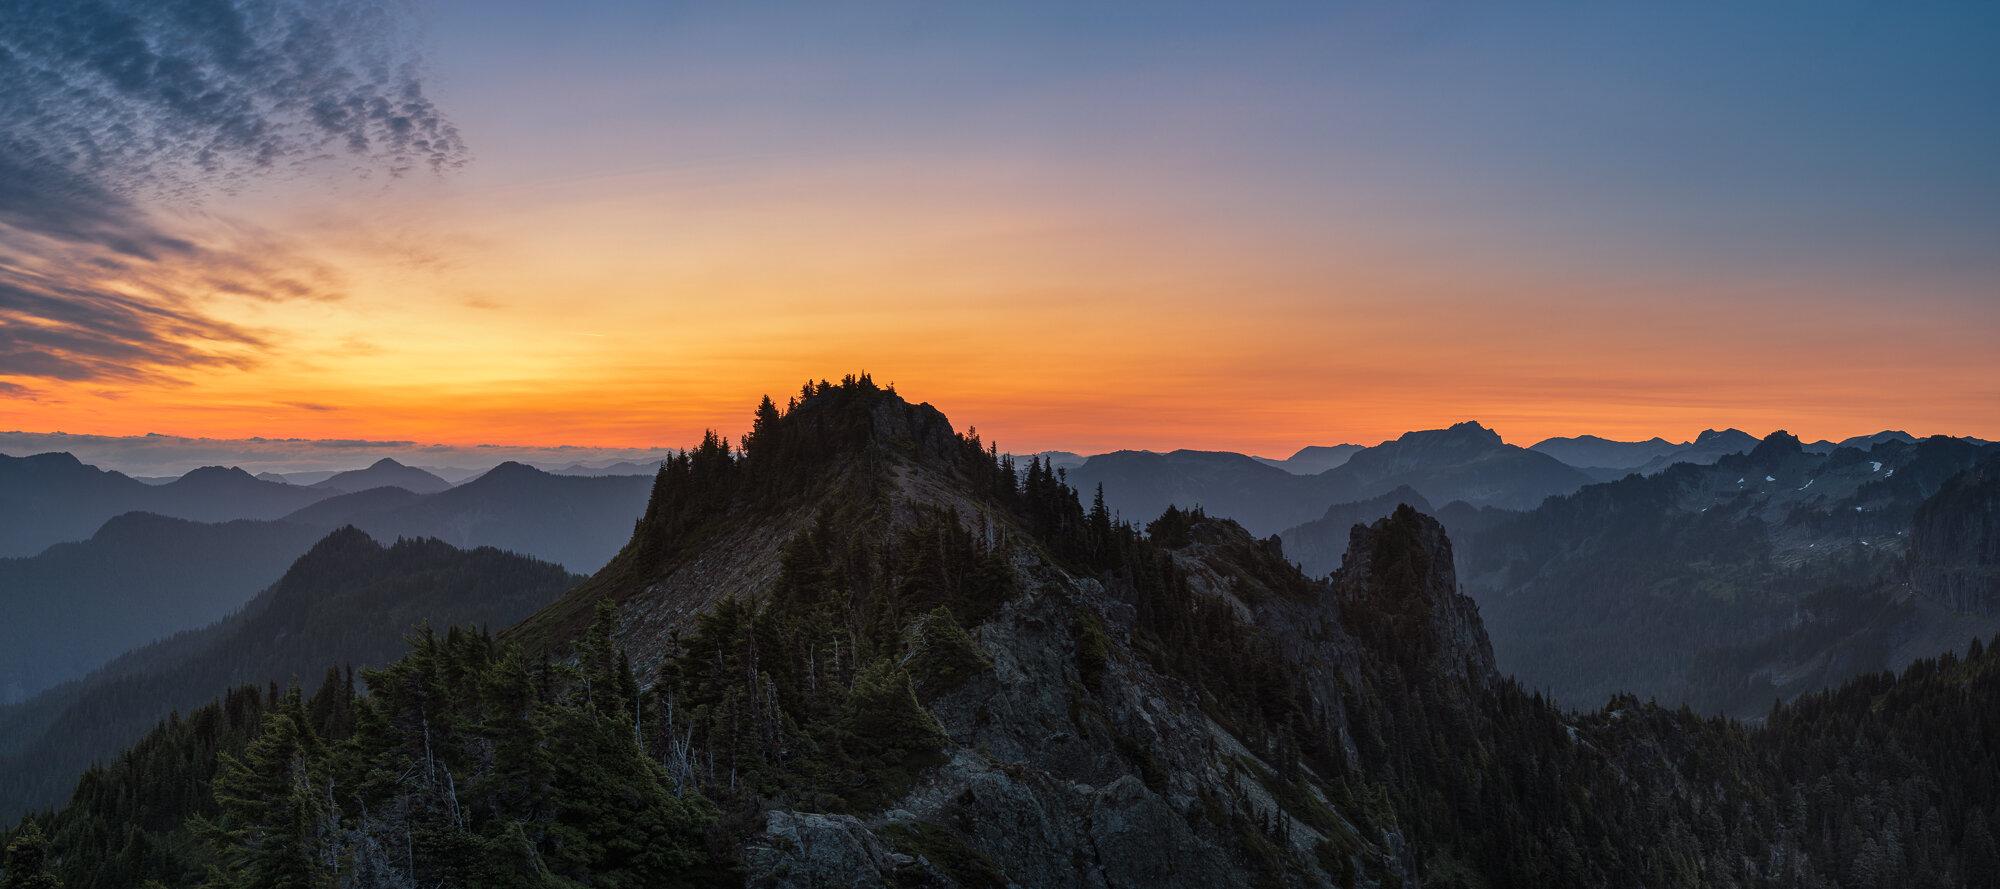 Mount Rainier Photography: 'Tolmie Layers'